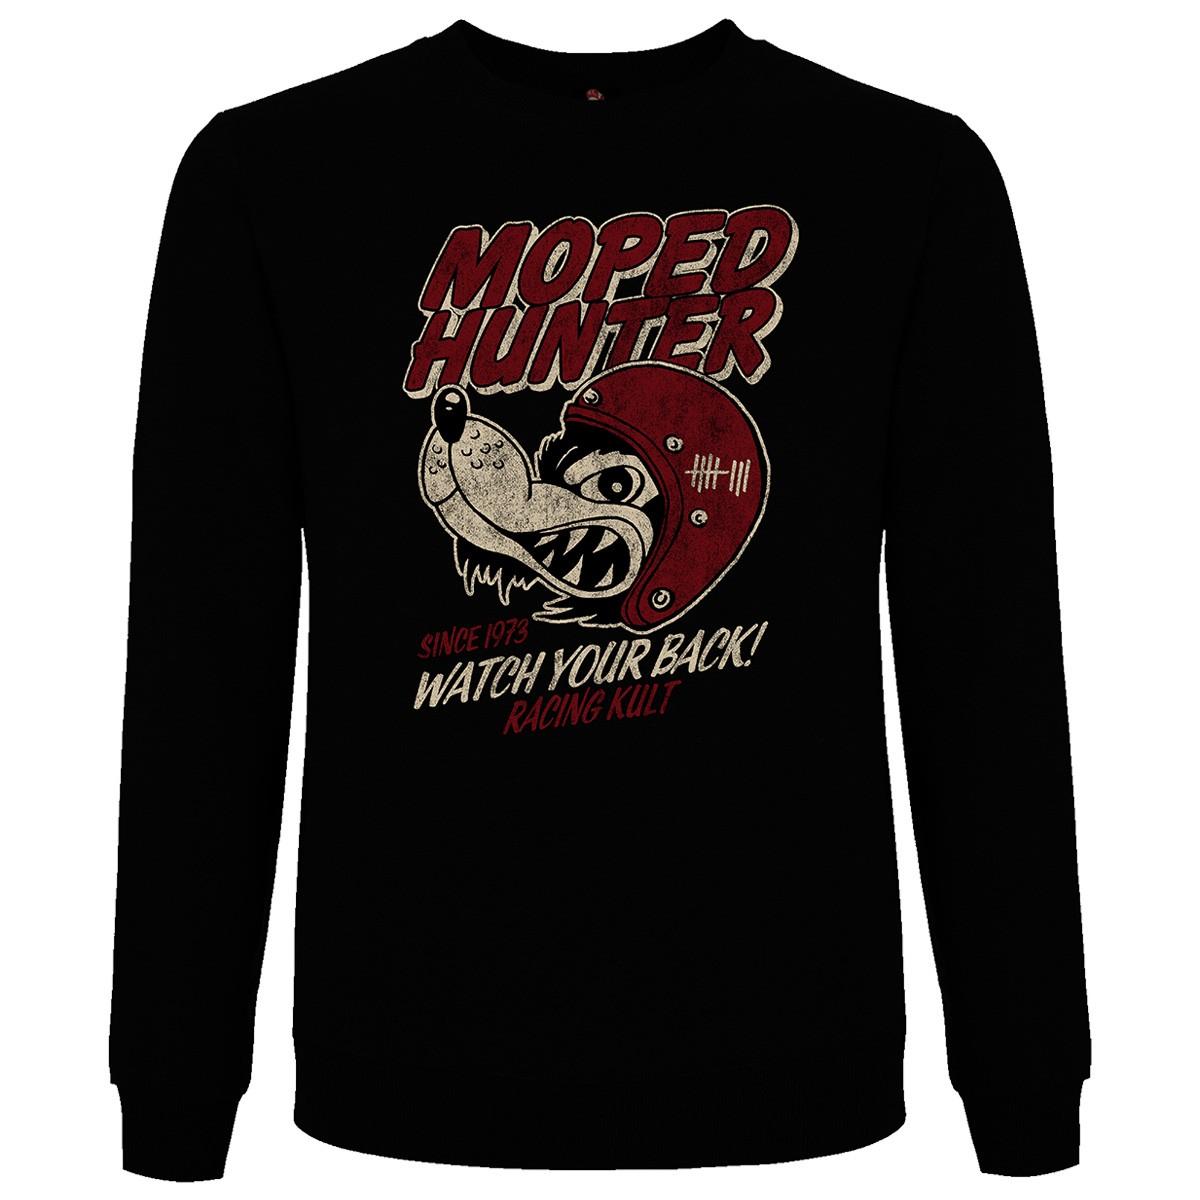 Racing Kult Sweatshirt Moped Hunter Frontprint